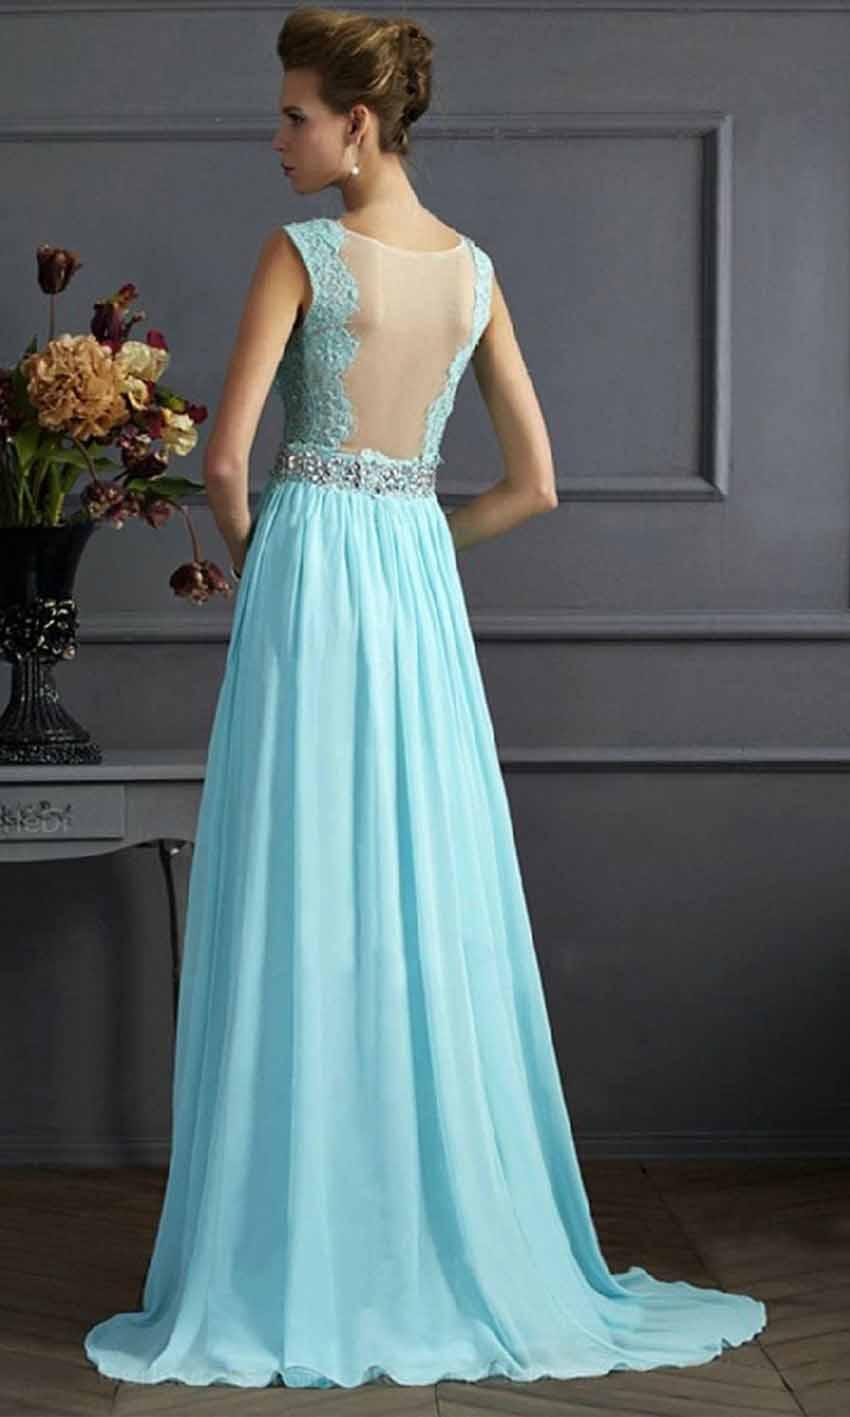 Turquoise Lace V-neck Long Prom Dress Sheer Back KSP459 [KSP459 ...